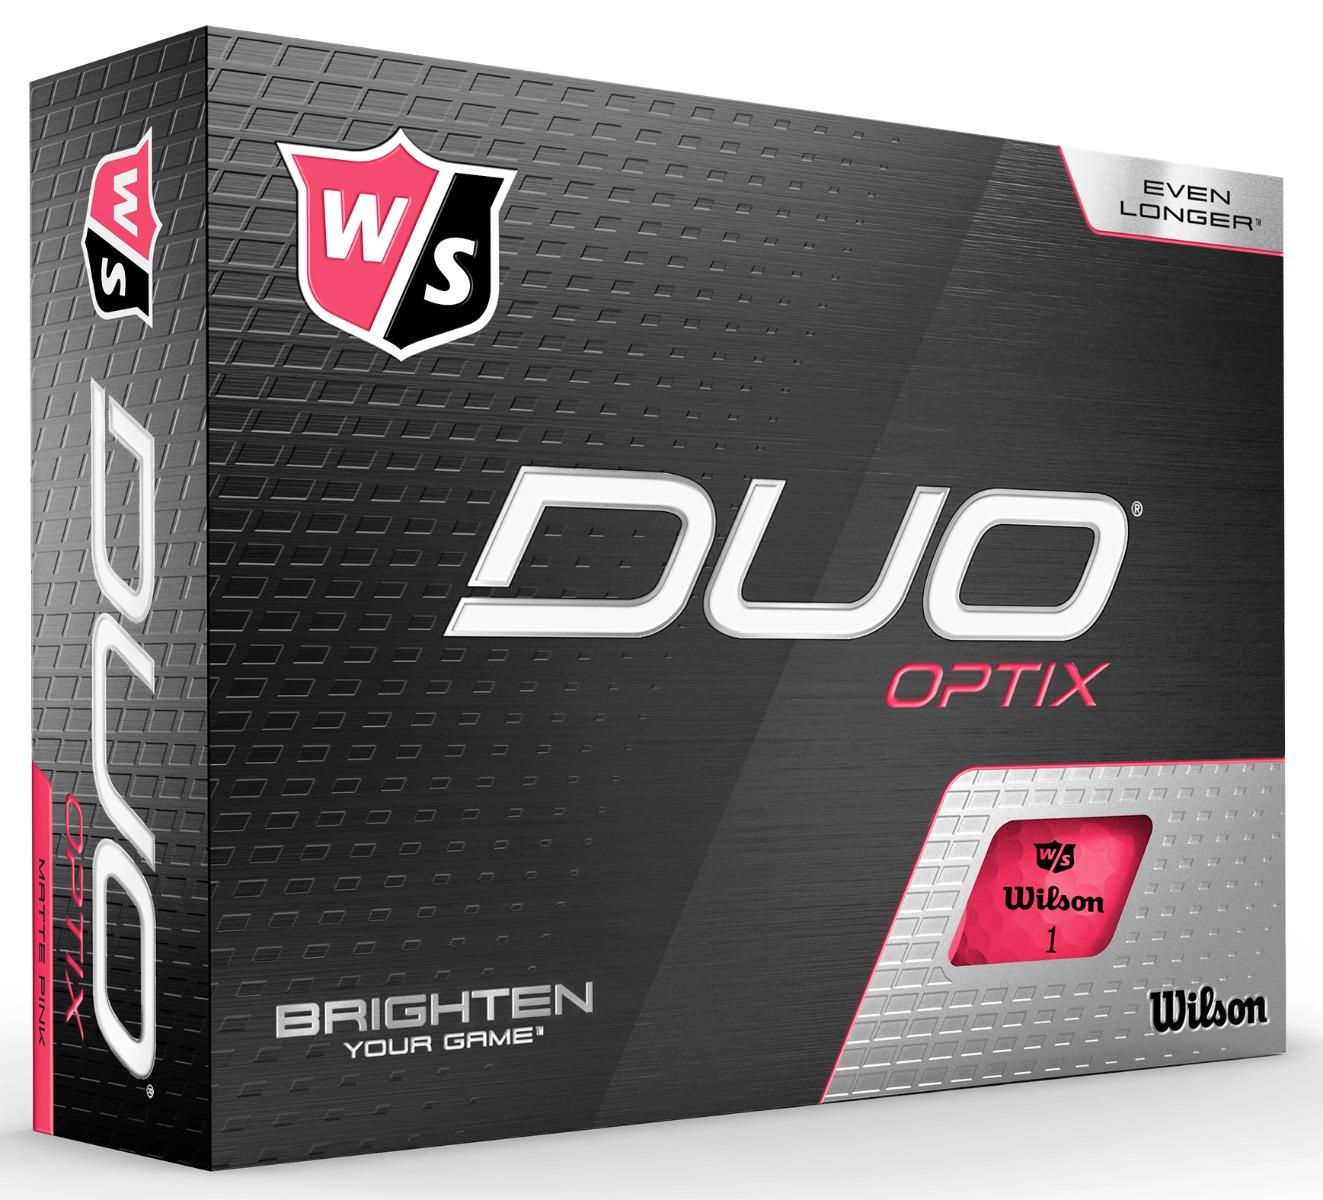 https://www.best4sportsballs.com/pub/media/catalog/product/d/u/duo_optix_pink_box_600.jpg